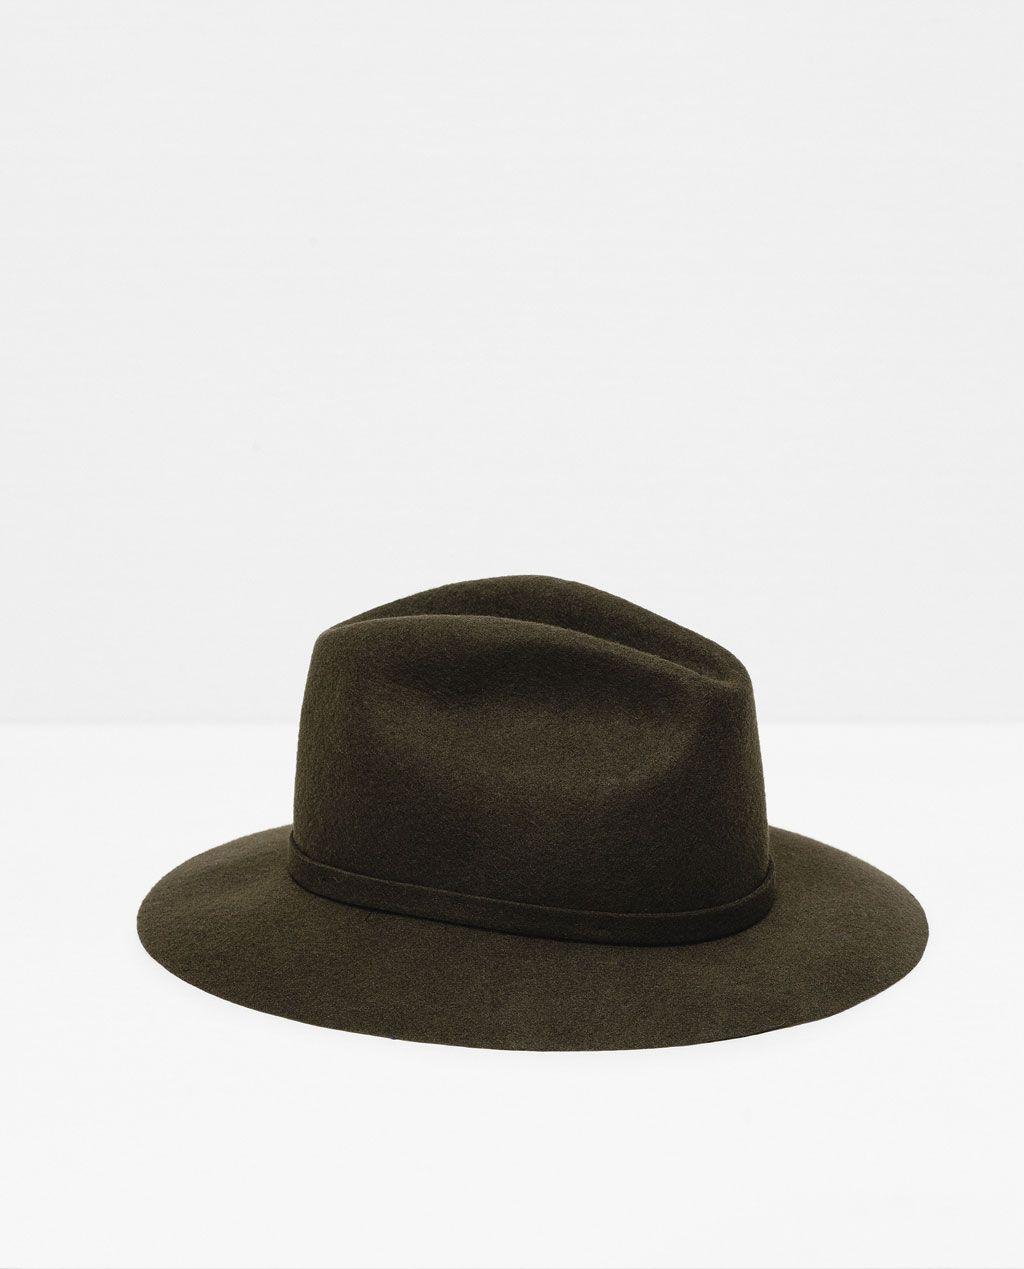 a2adb4e446 Image 1 of FELT HAT from Zara | Wishlist | Felt hat, Hats, Zara